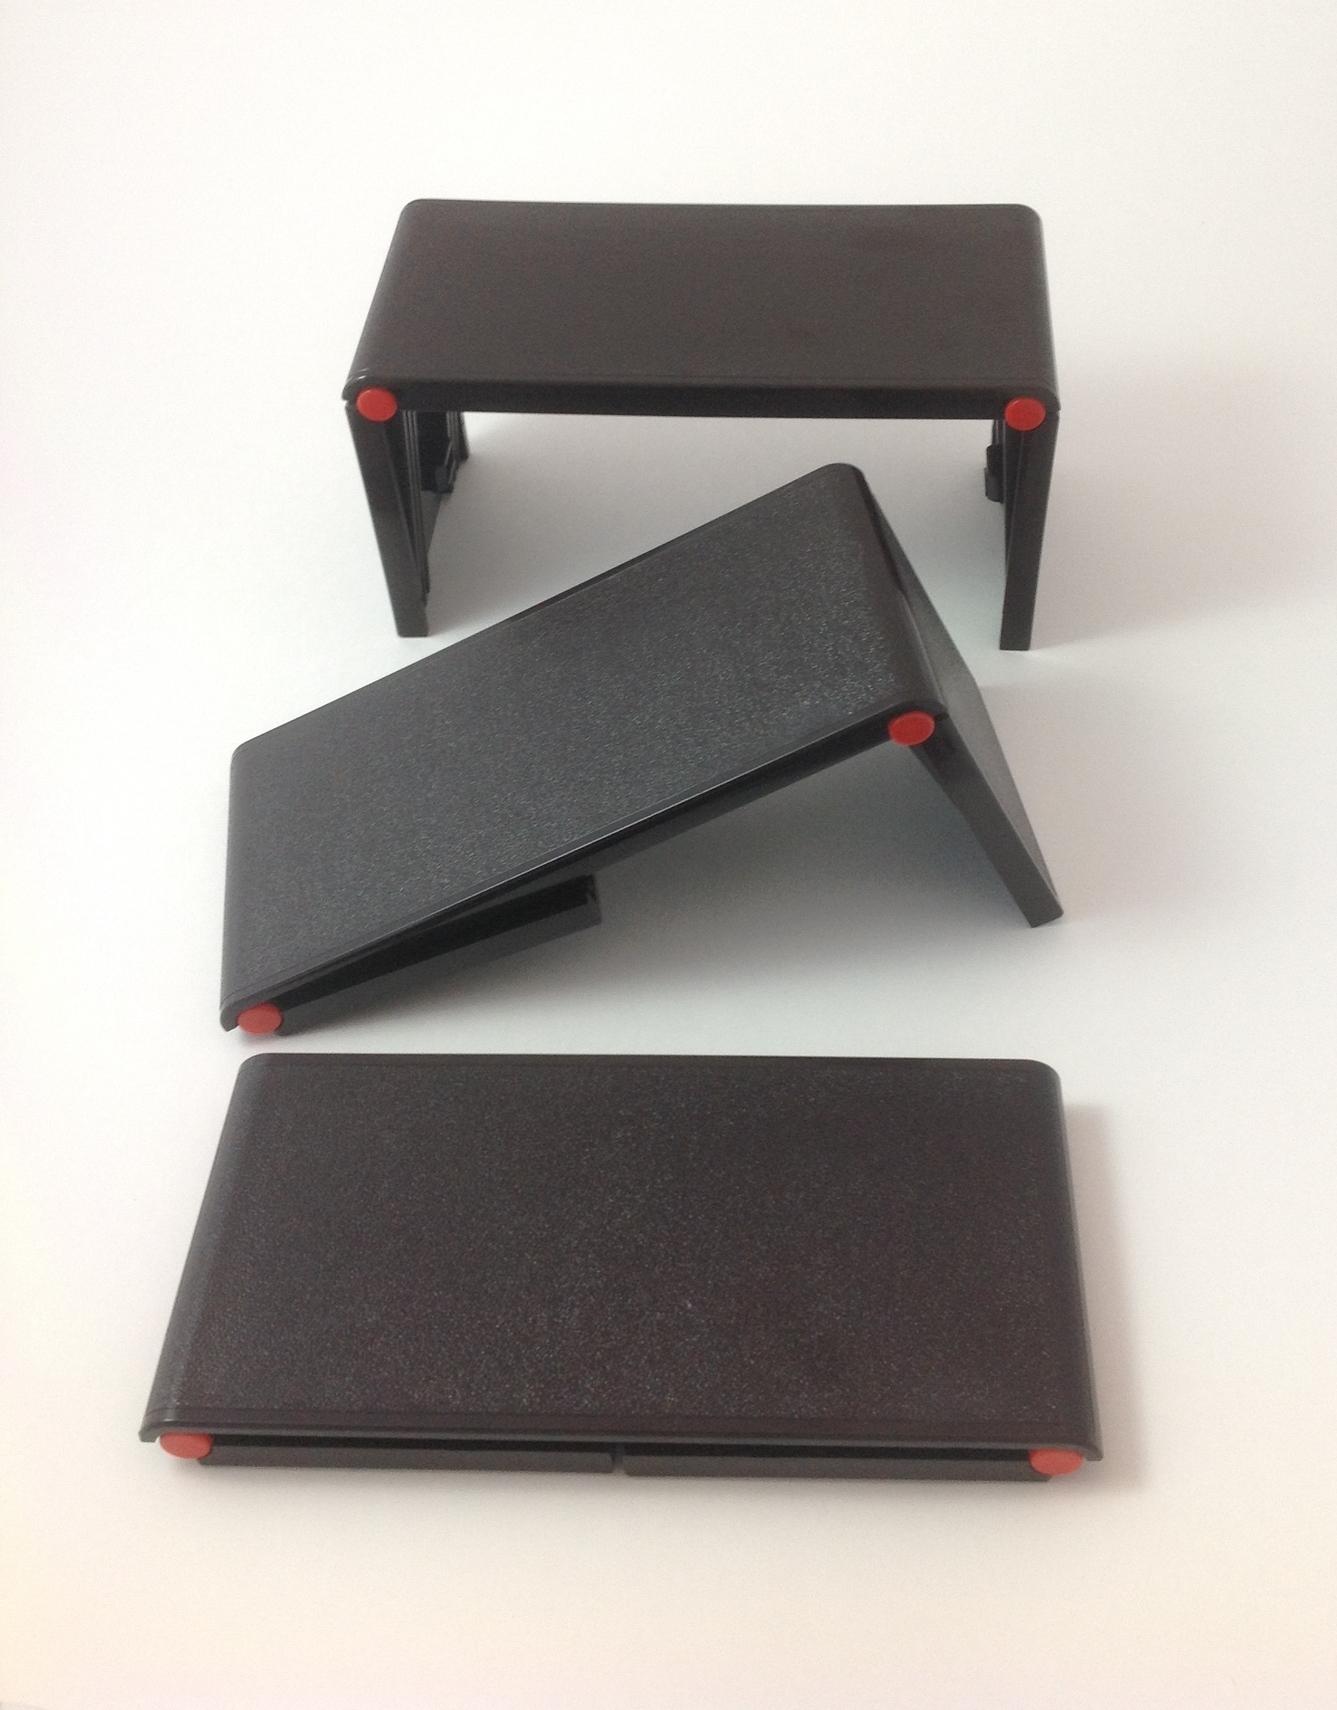 footrest in lightbox.JPG